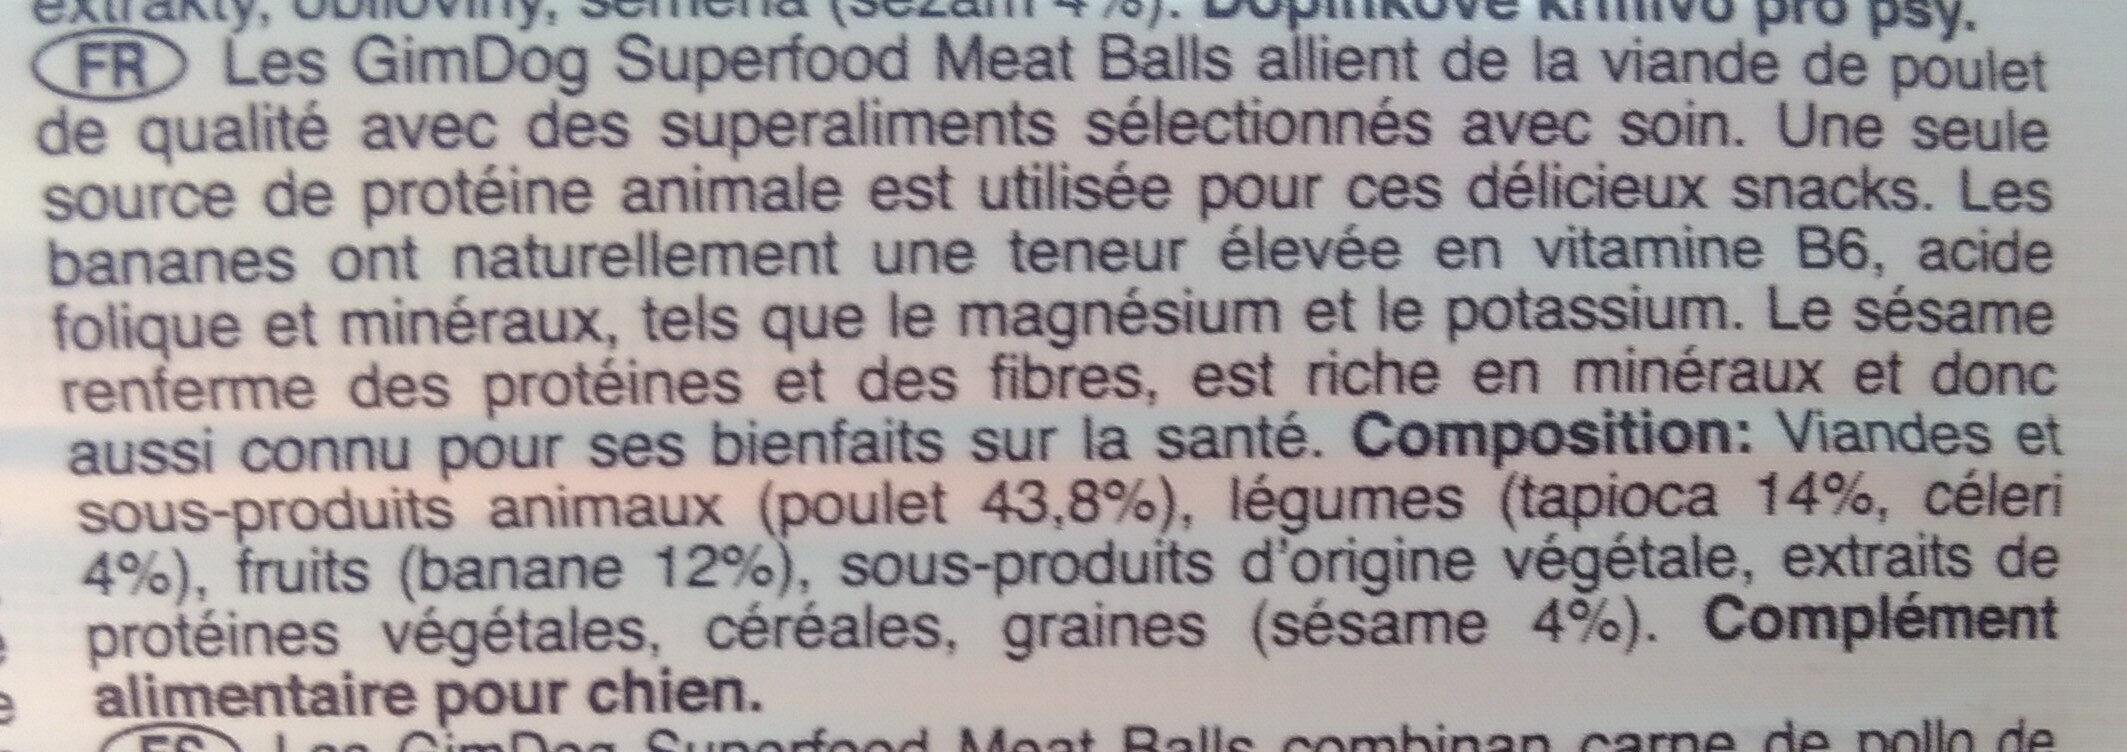 Superfood Meat Balls - Ingredients